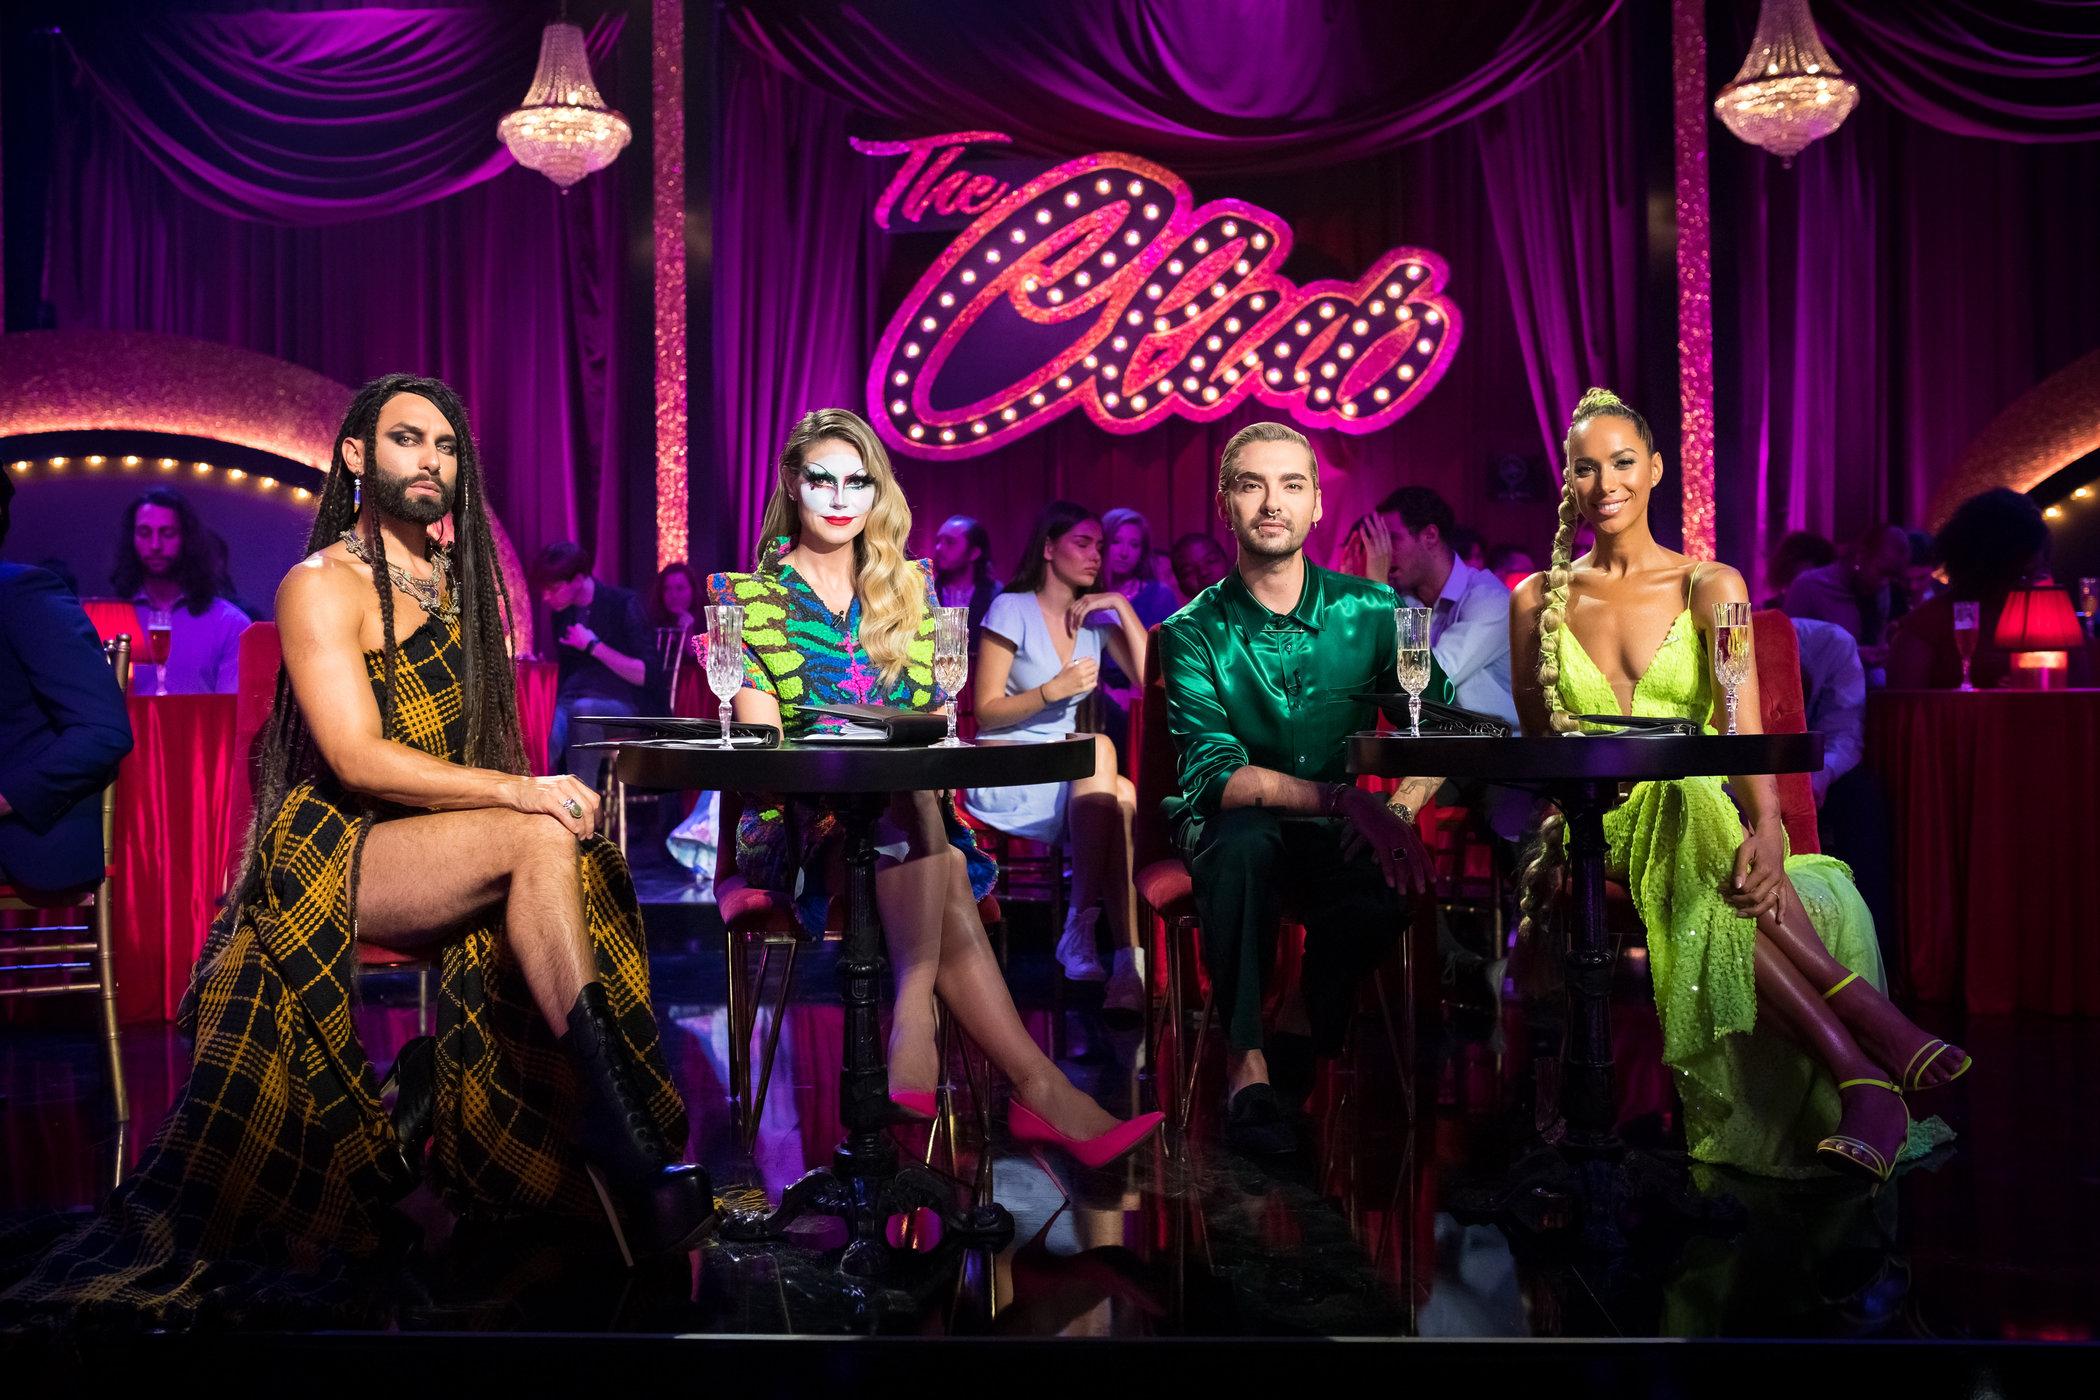 Conchita Wurst, Heidi Klum, Bill Kaulitz und Leona Lewis.